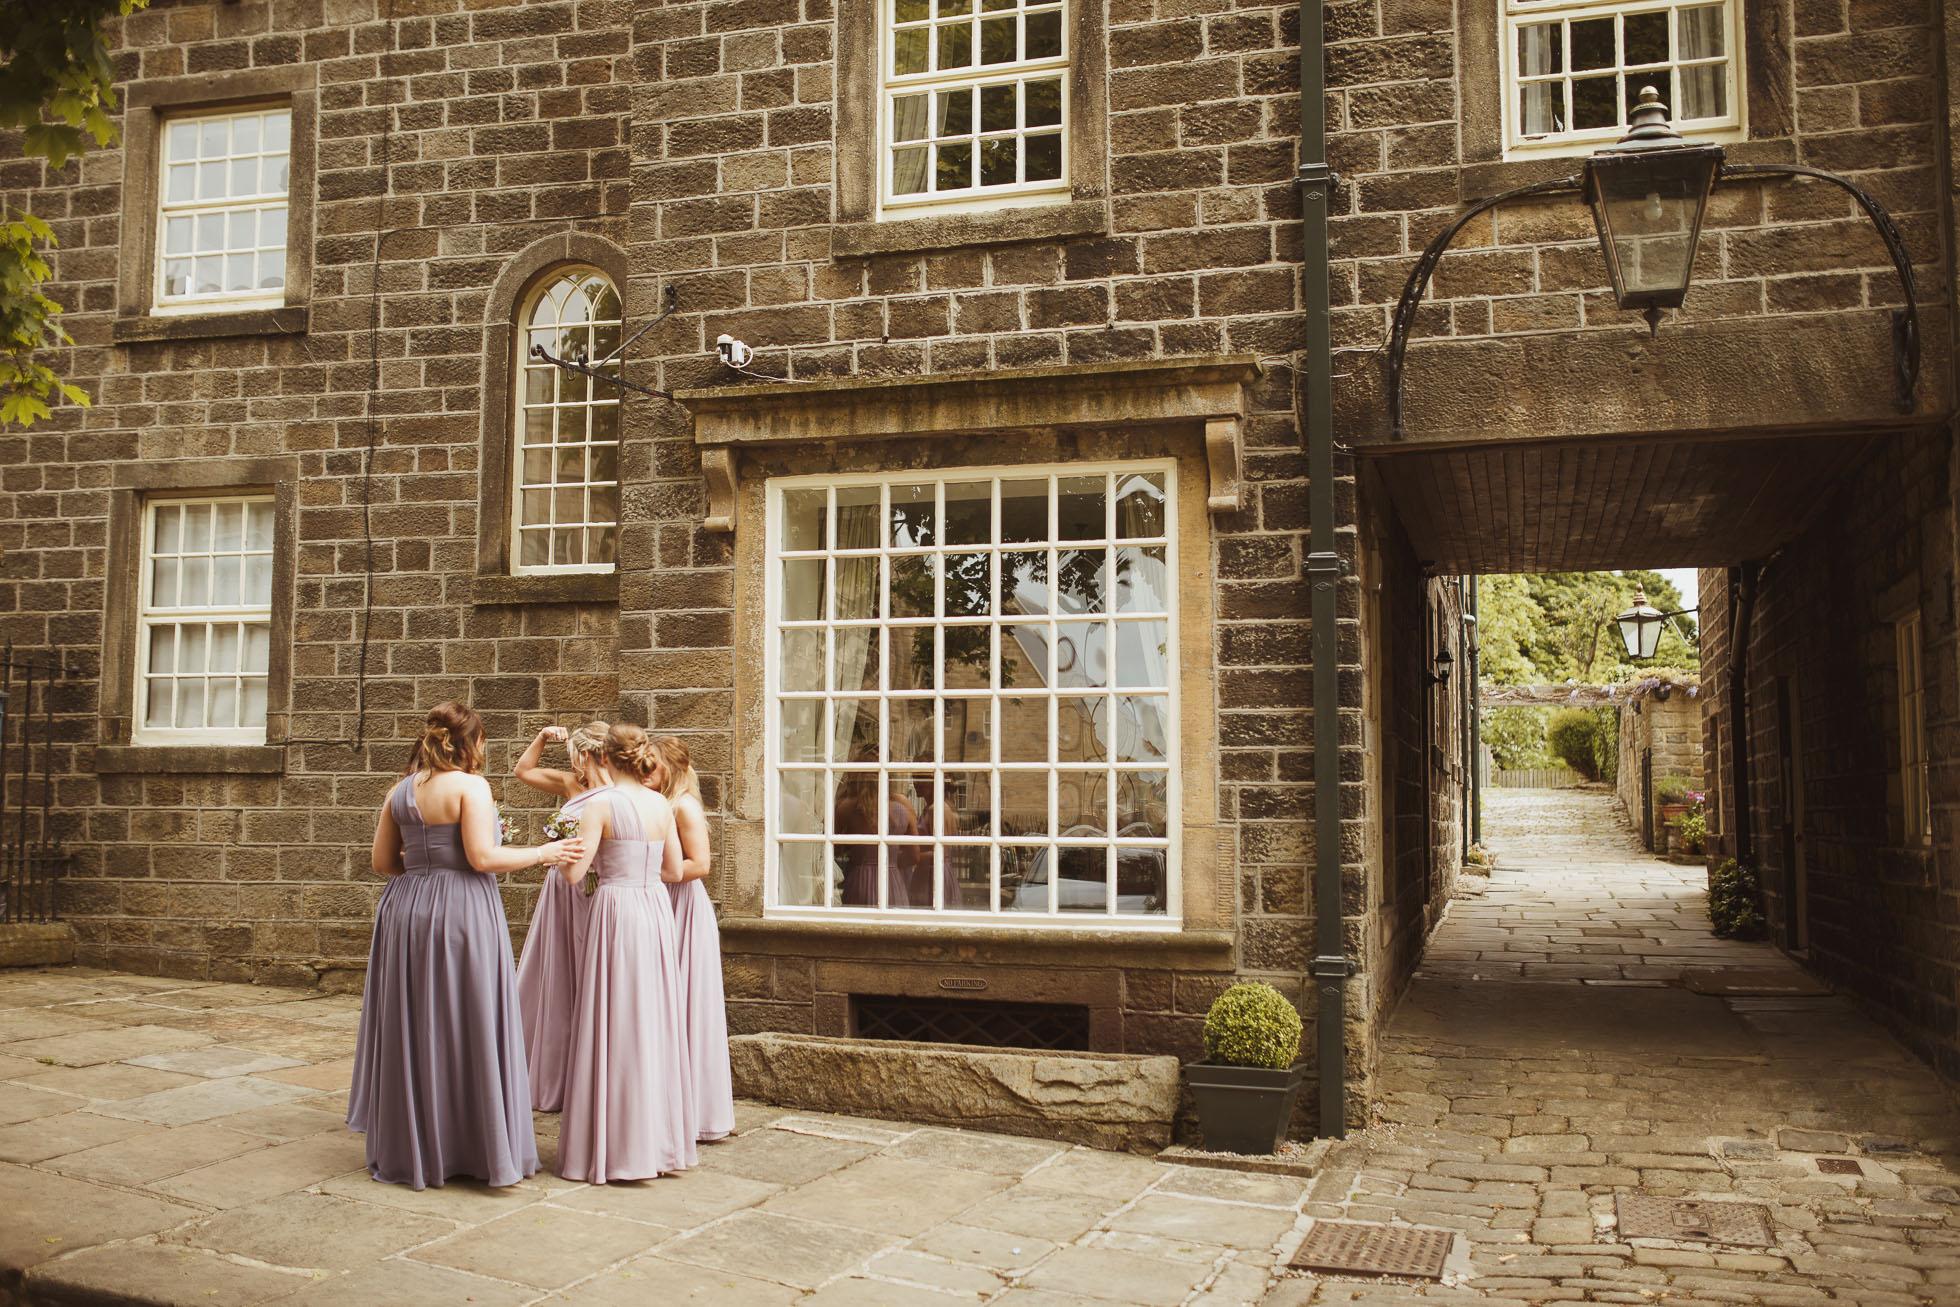 denton-hall-wedding-photographer-24.jpg